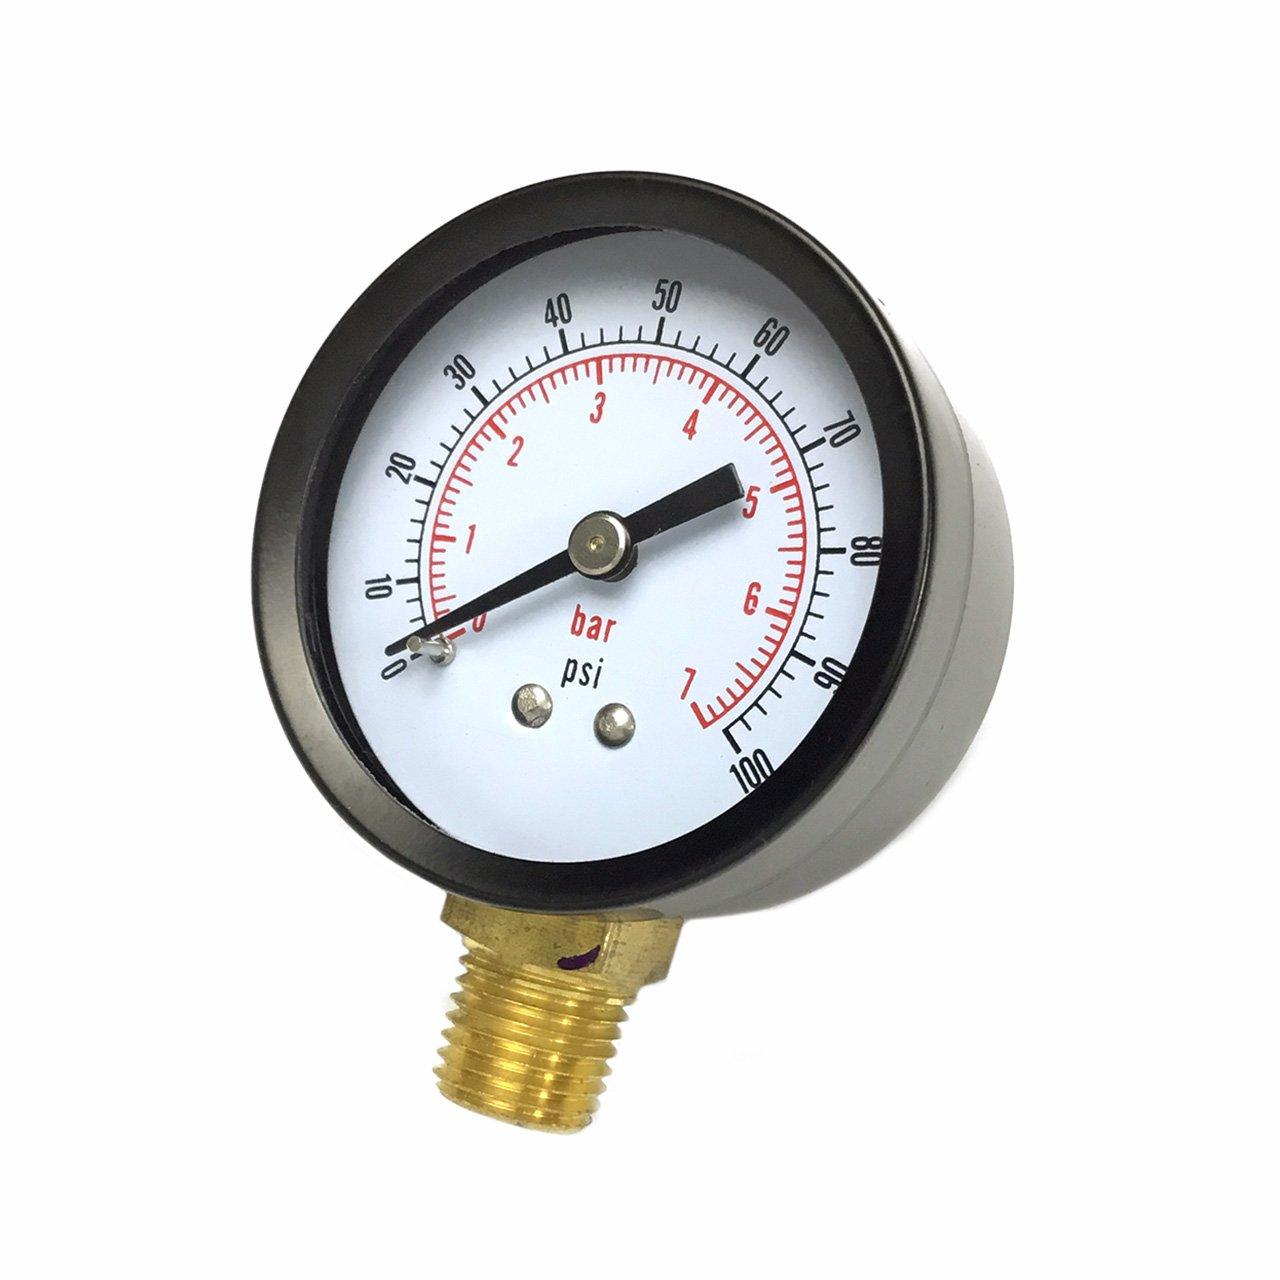 2 Pool Spa Filter Water Pressure Gauge Bottom Mount 1 4 Pipe Thread 0 100 PSI